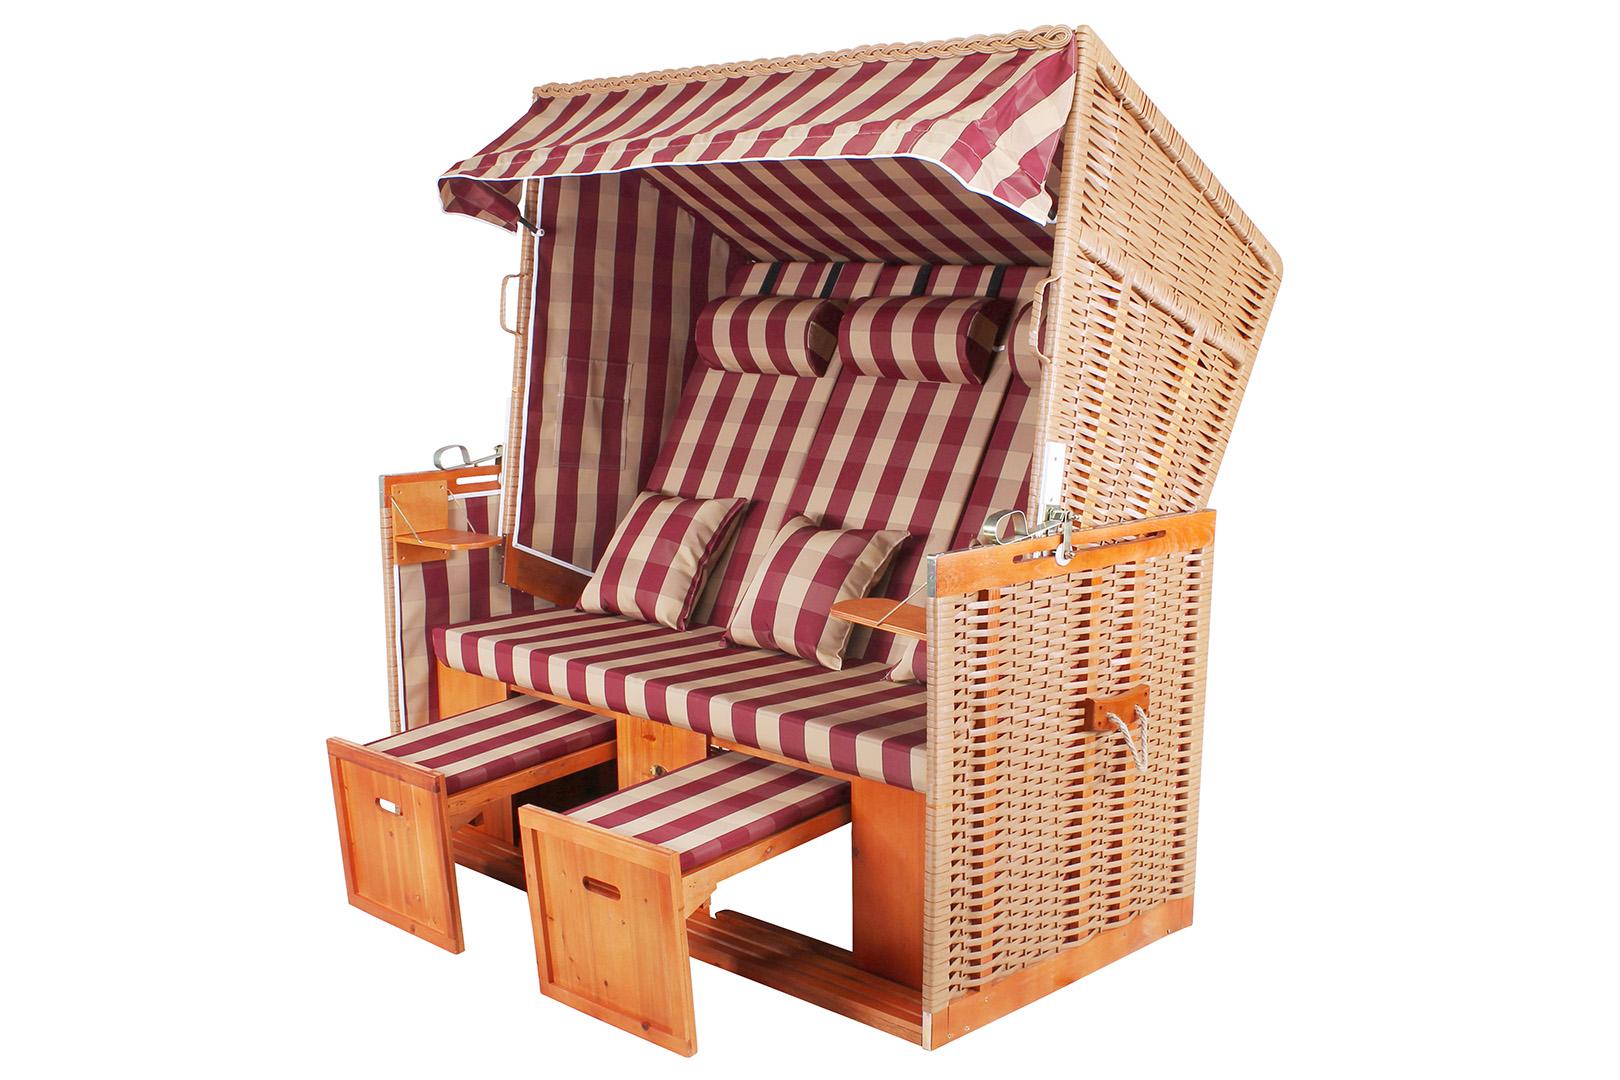 strandkorb nordsee sylt xxxl volllieger rattan ostsee 156. Black Bedroom Furniture Sets. Home Design Ideas